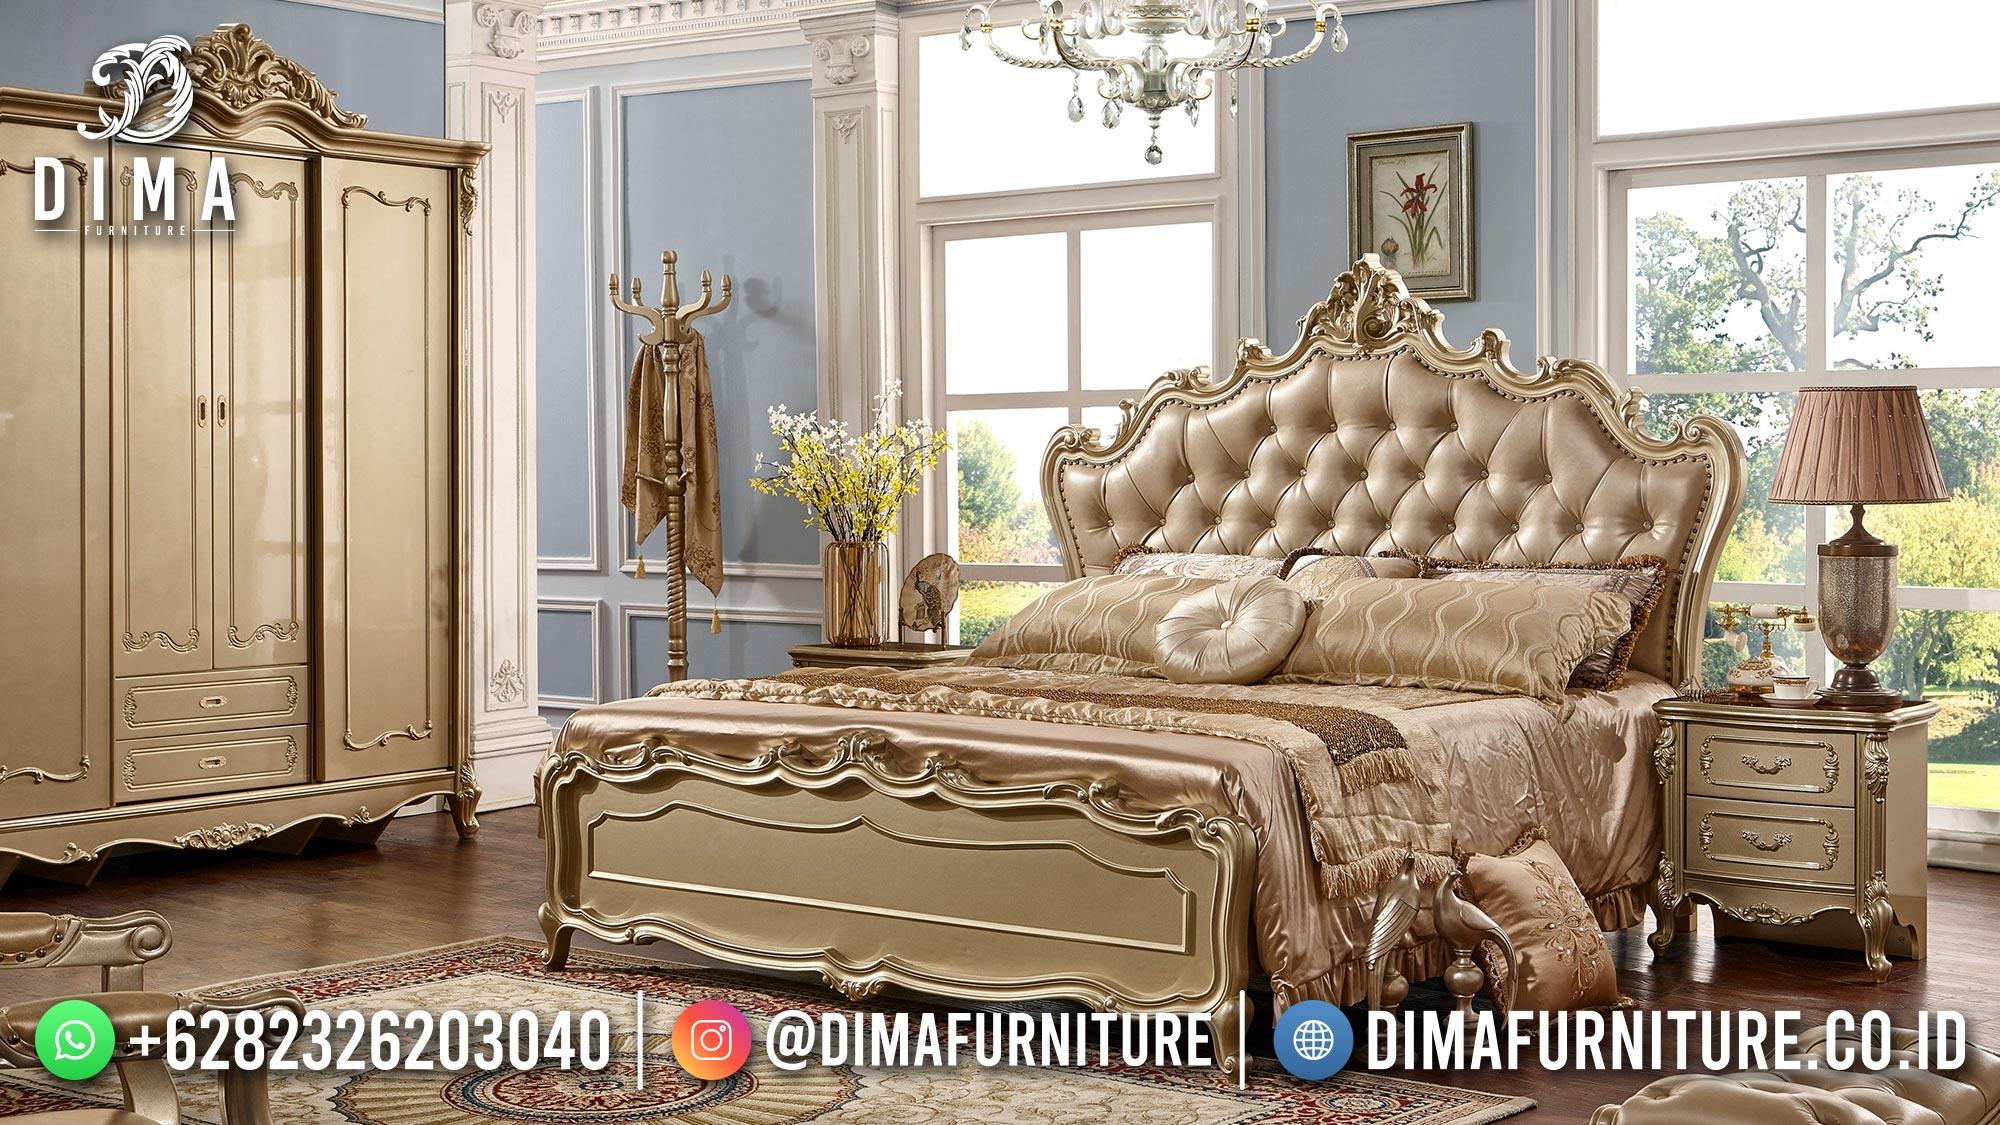 New Tempat Tidur Mewah Terbaru Luxury Glorious Style ST-1415